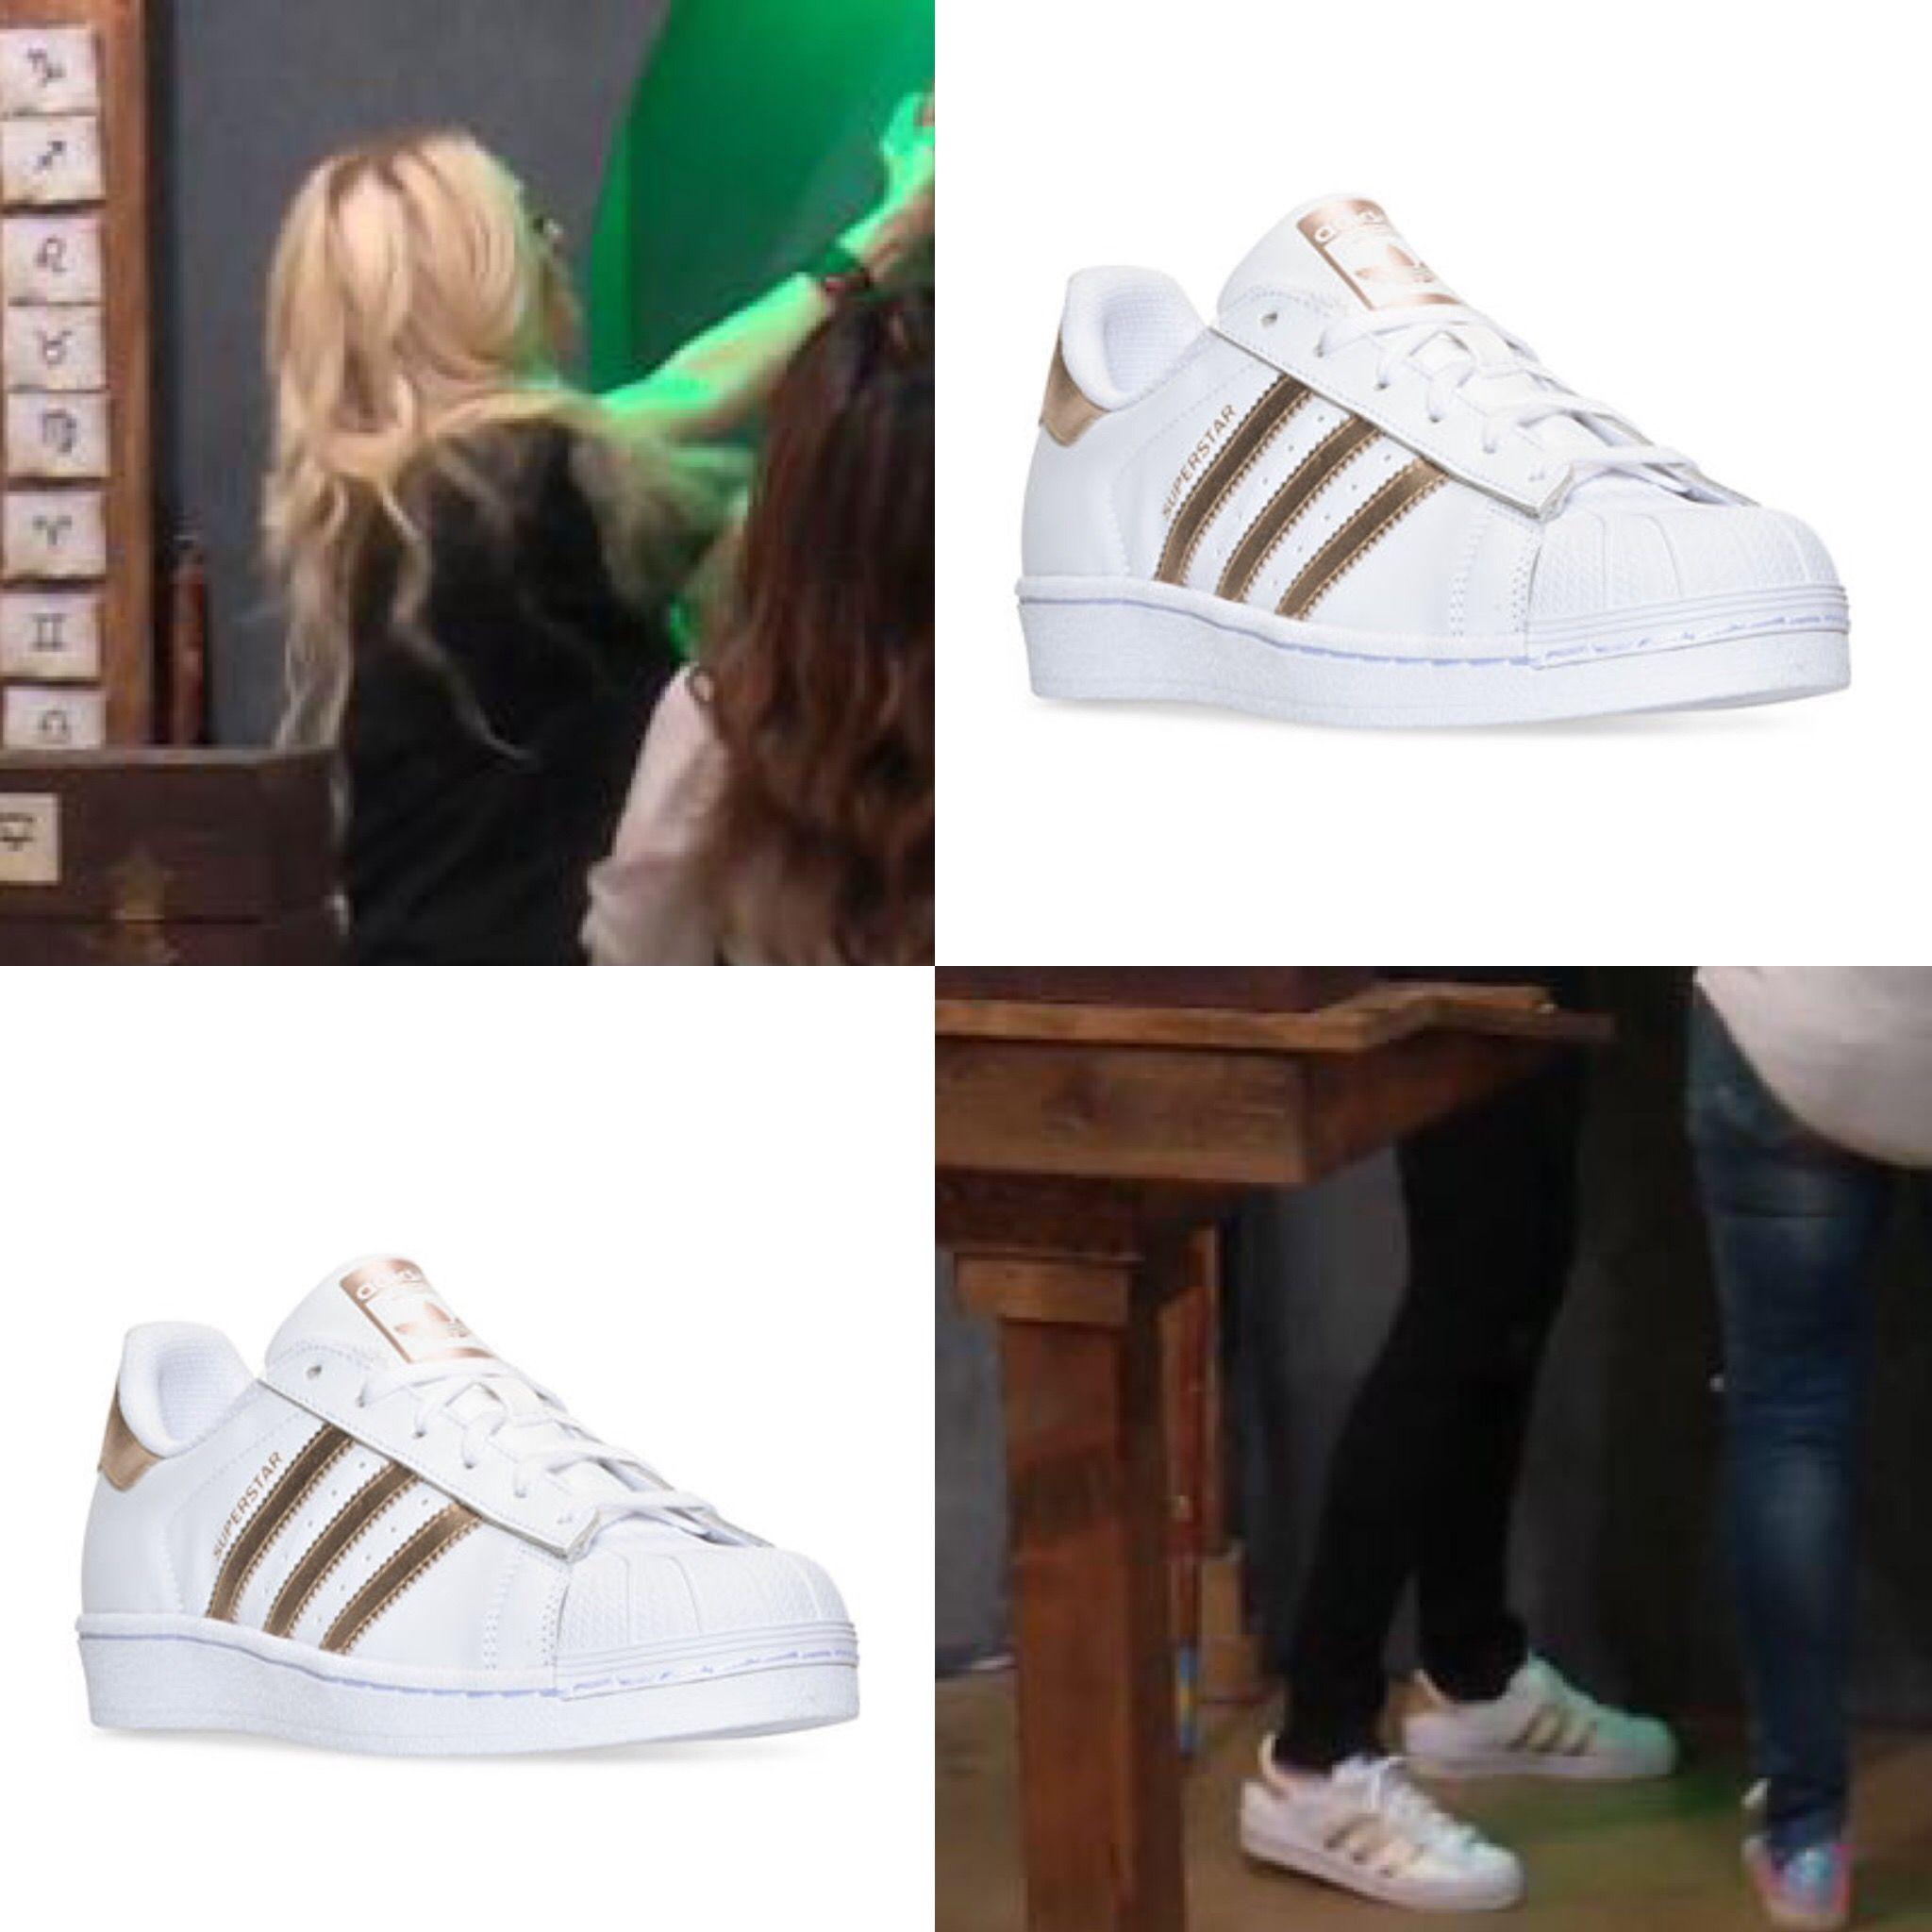 Erika Girardi's Gold Adidas Sneakers